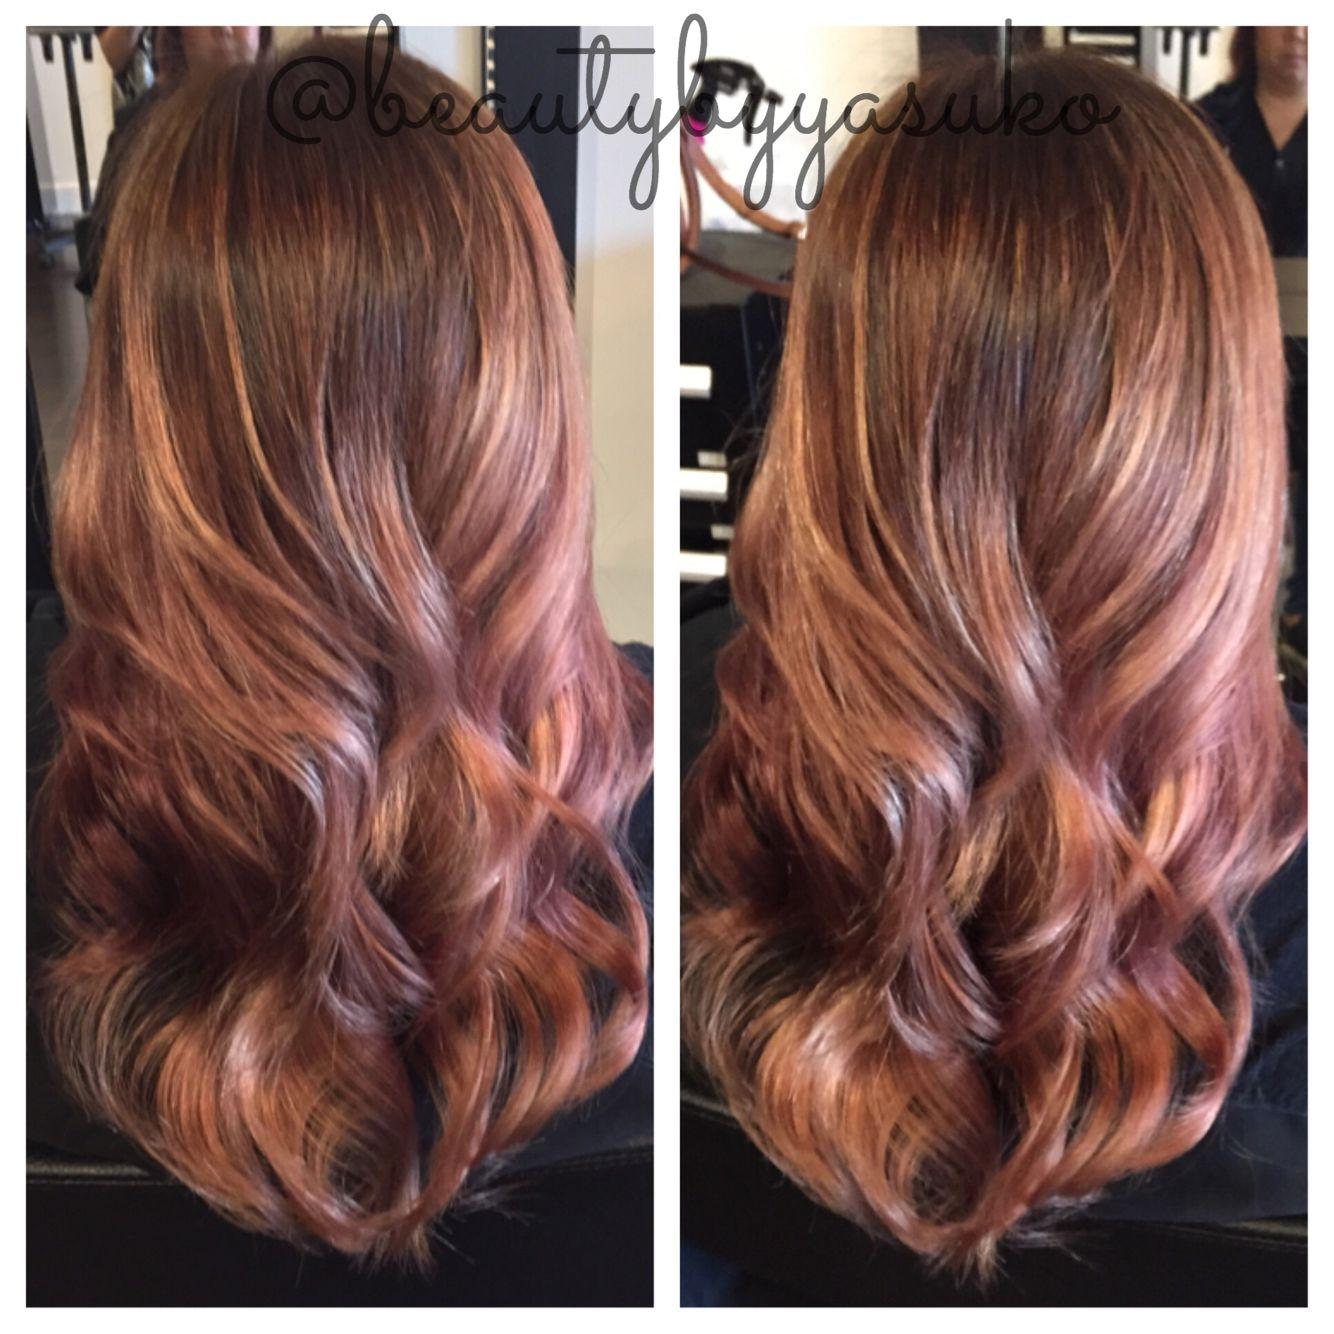 Rose gold balayage ombre hair by @beautybyyasuko